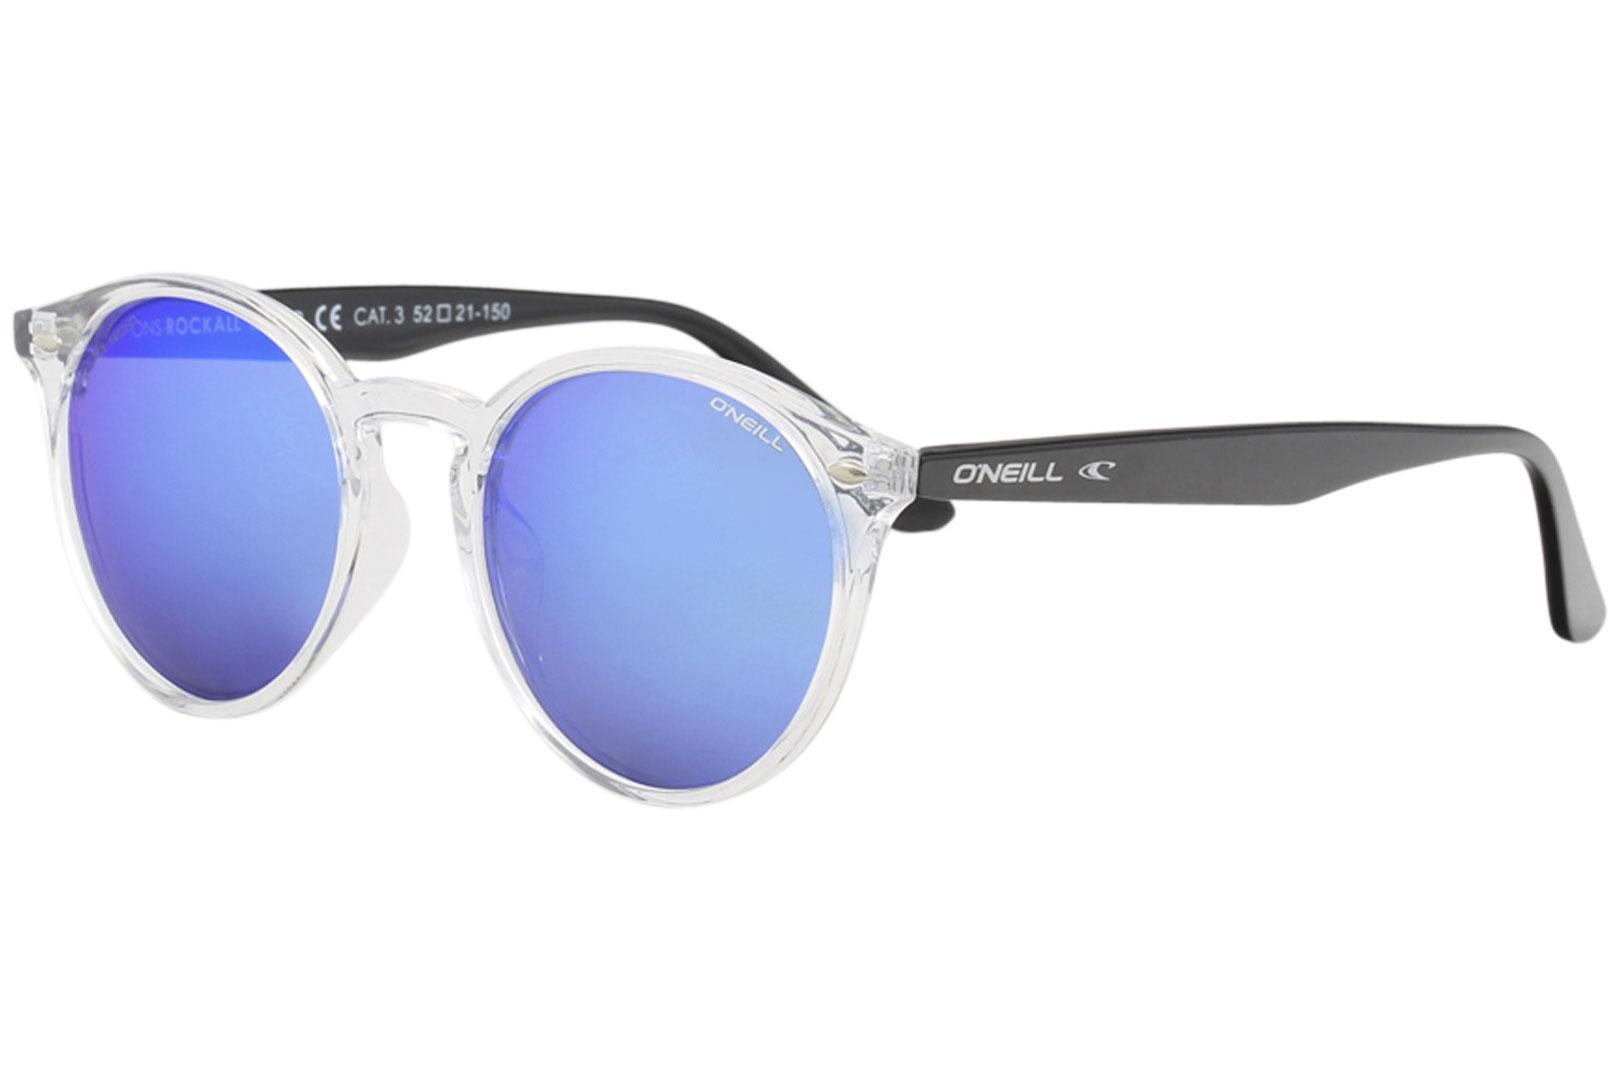 f926aae66e O Neill Men s Ons-Rockall Fashion Round ONeill Sunglasses by O Neill